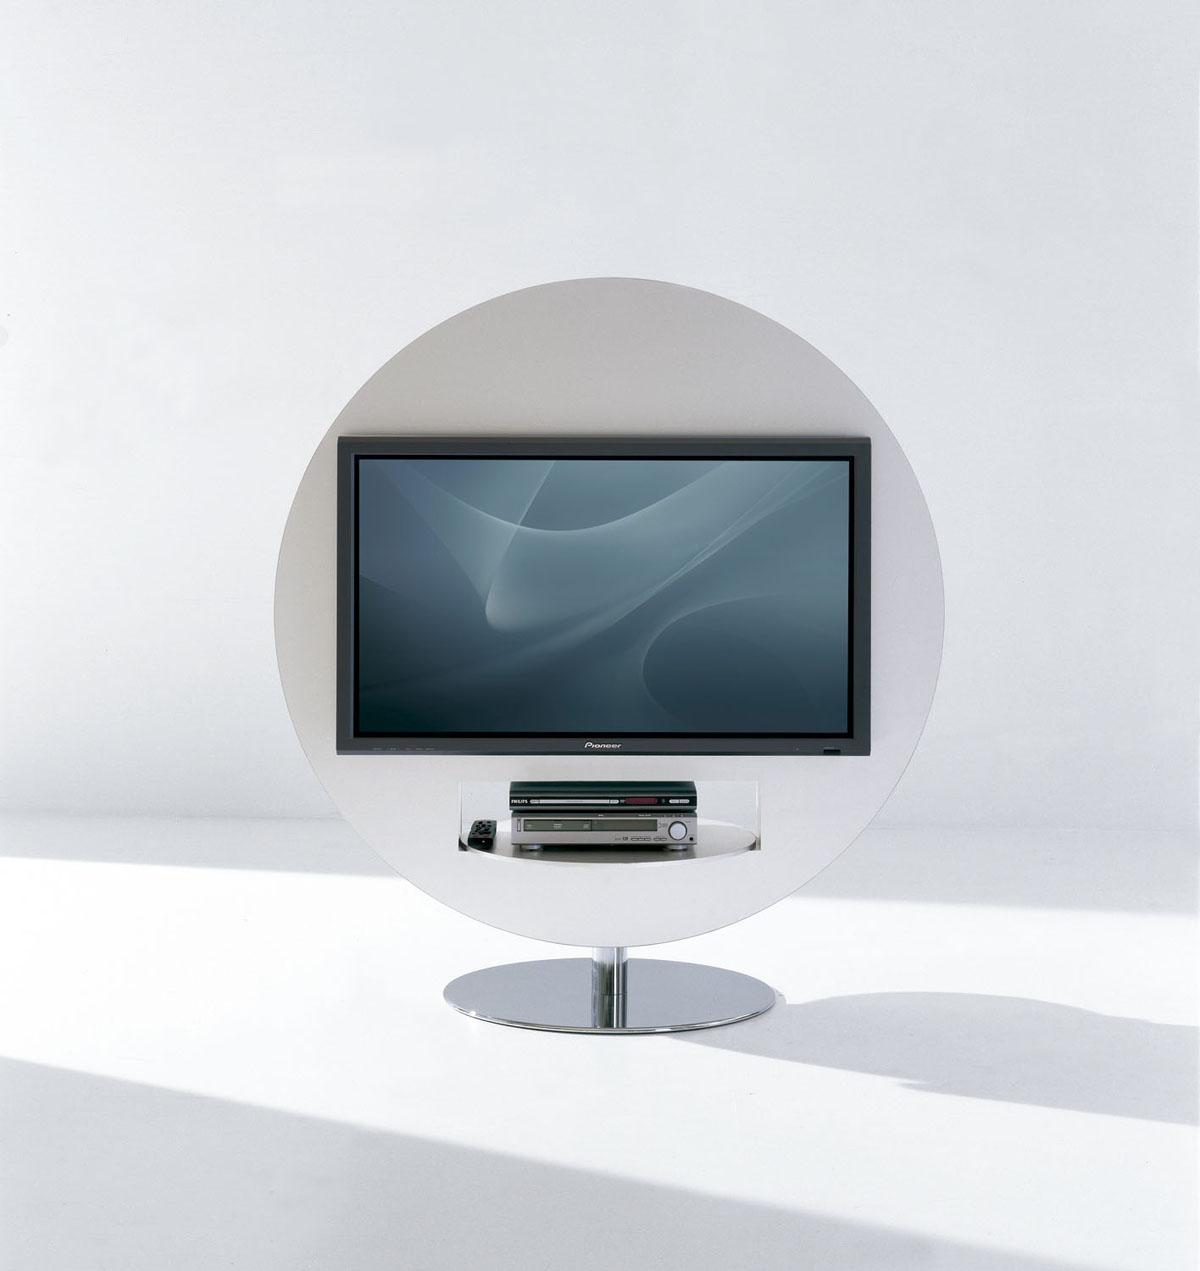 Muebles de dise o mayo 2012 - Mueble giratorio tv ...